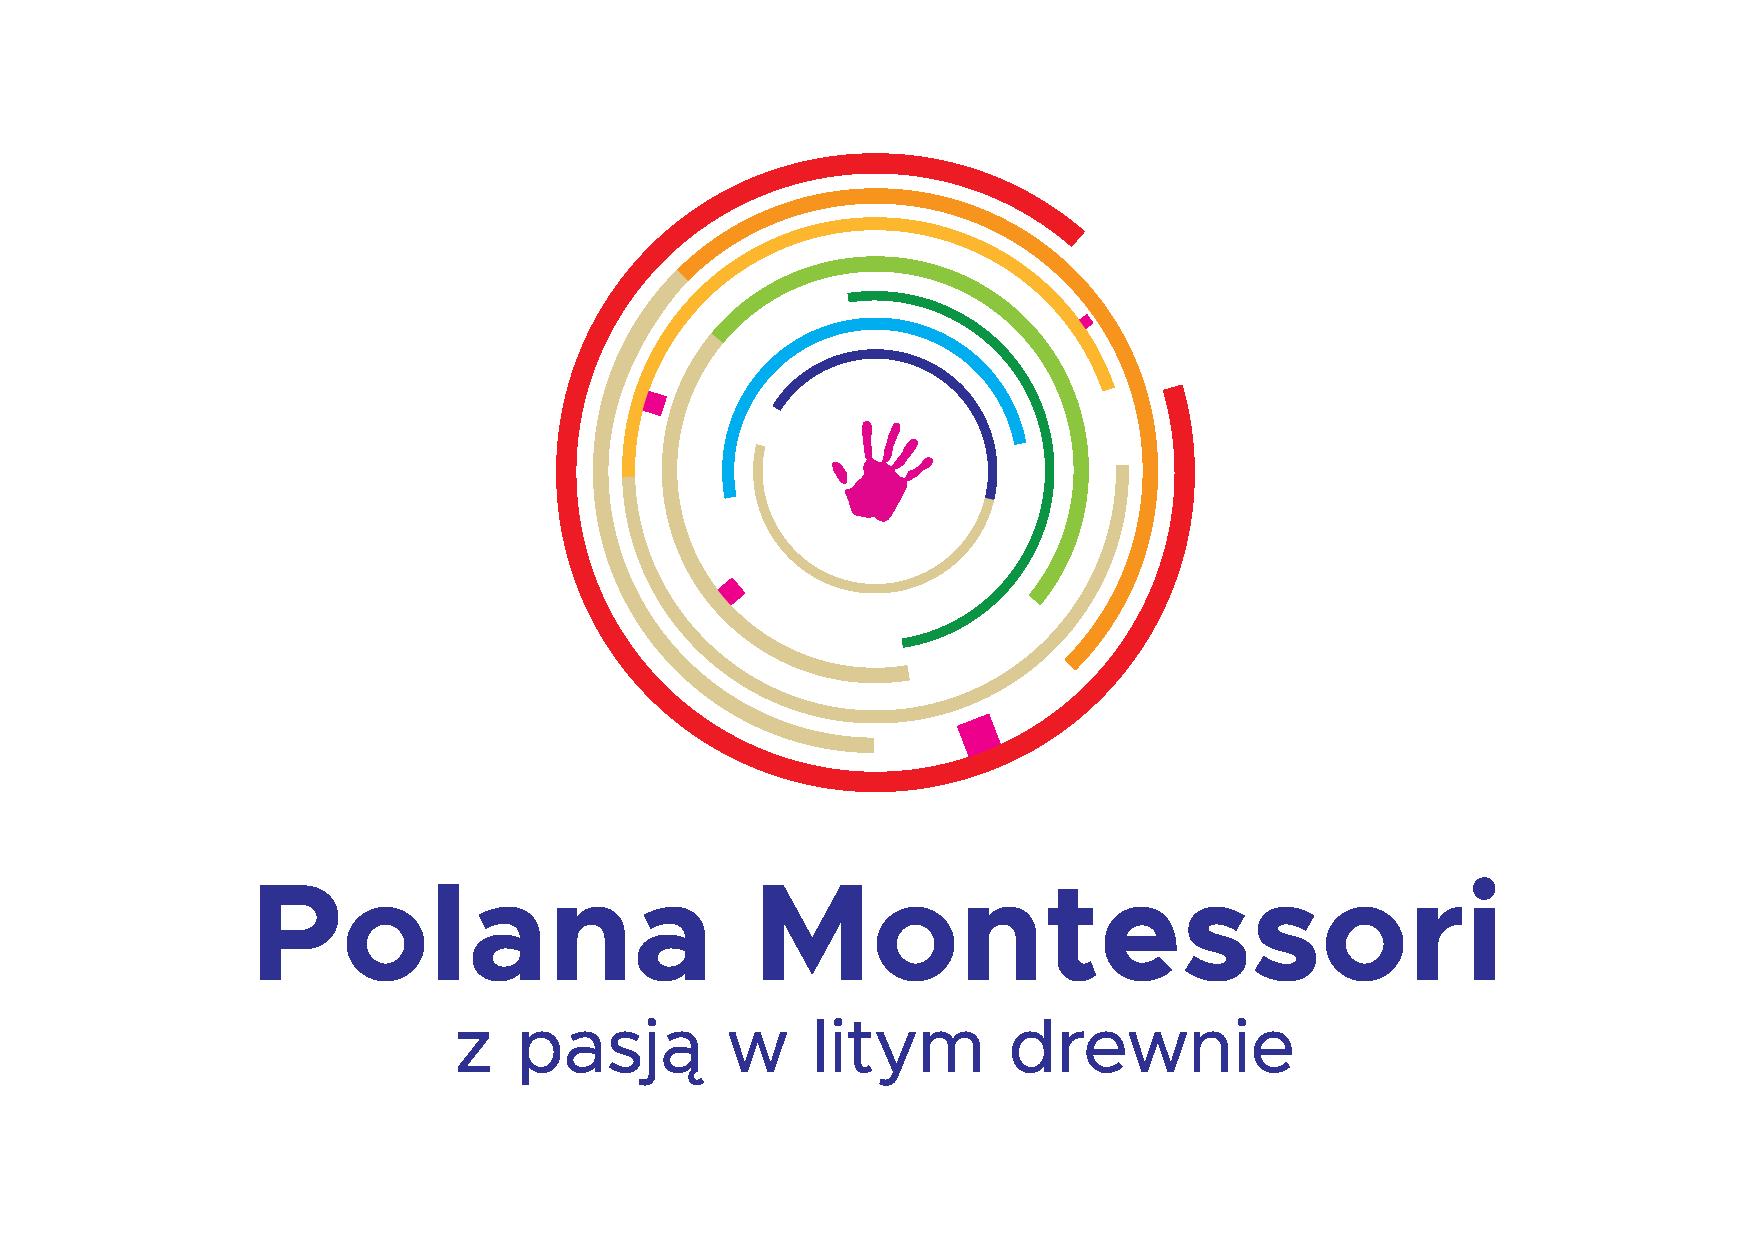 Polana Montessori